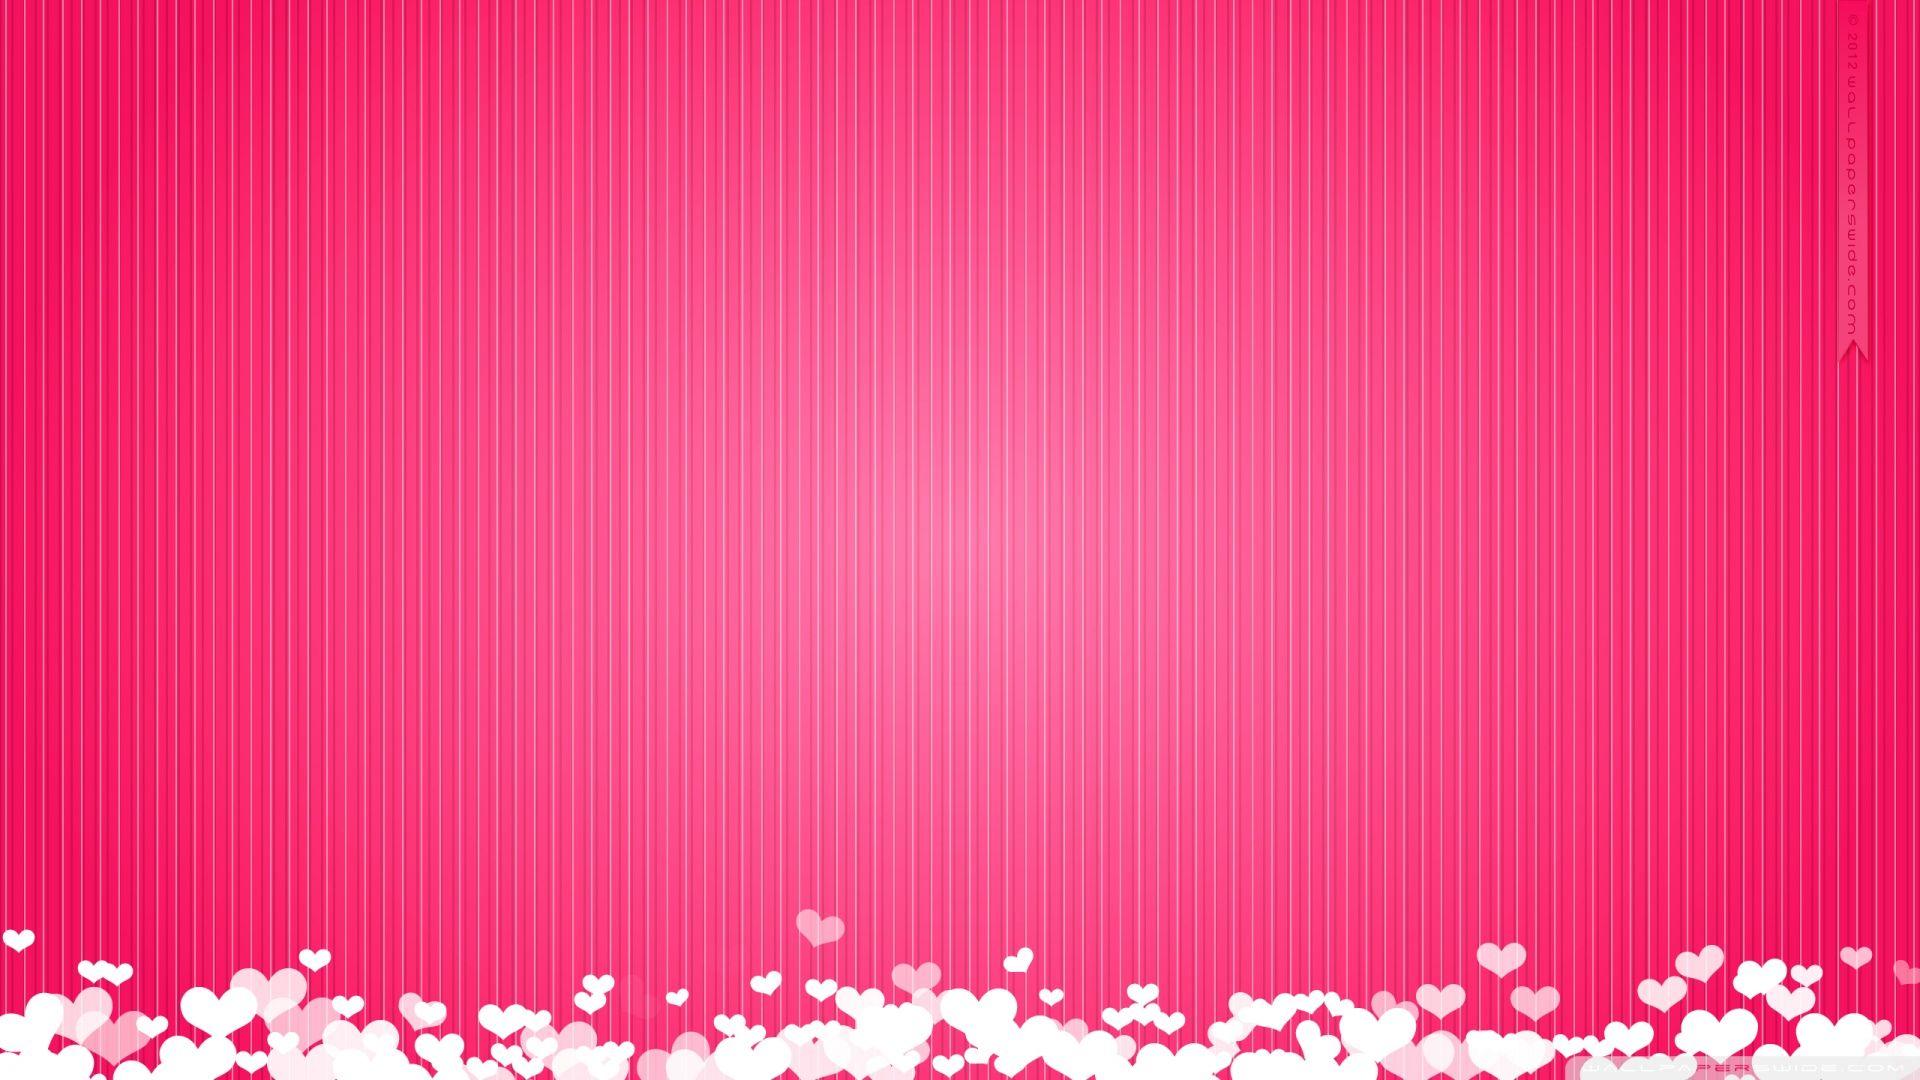 pink wallpapers hd 4k 32